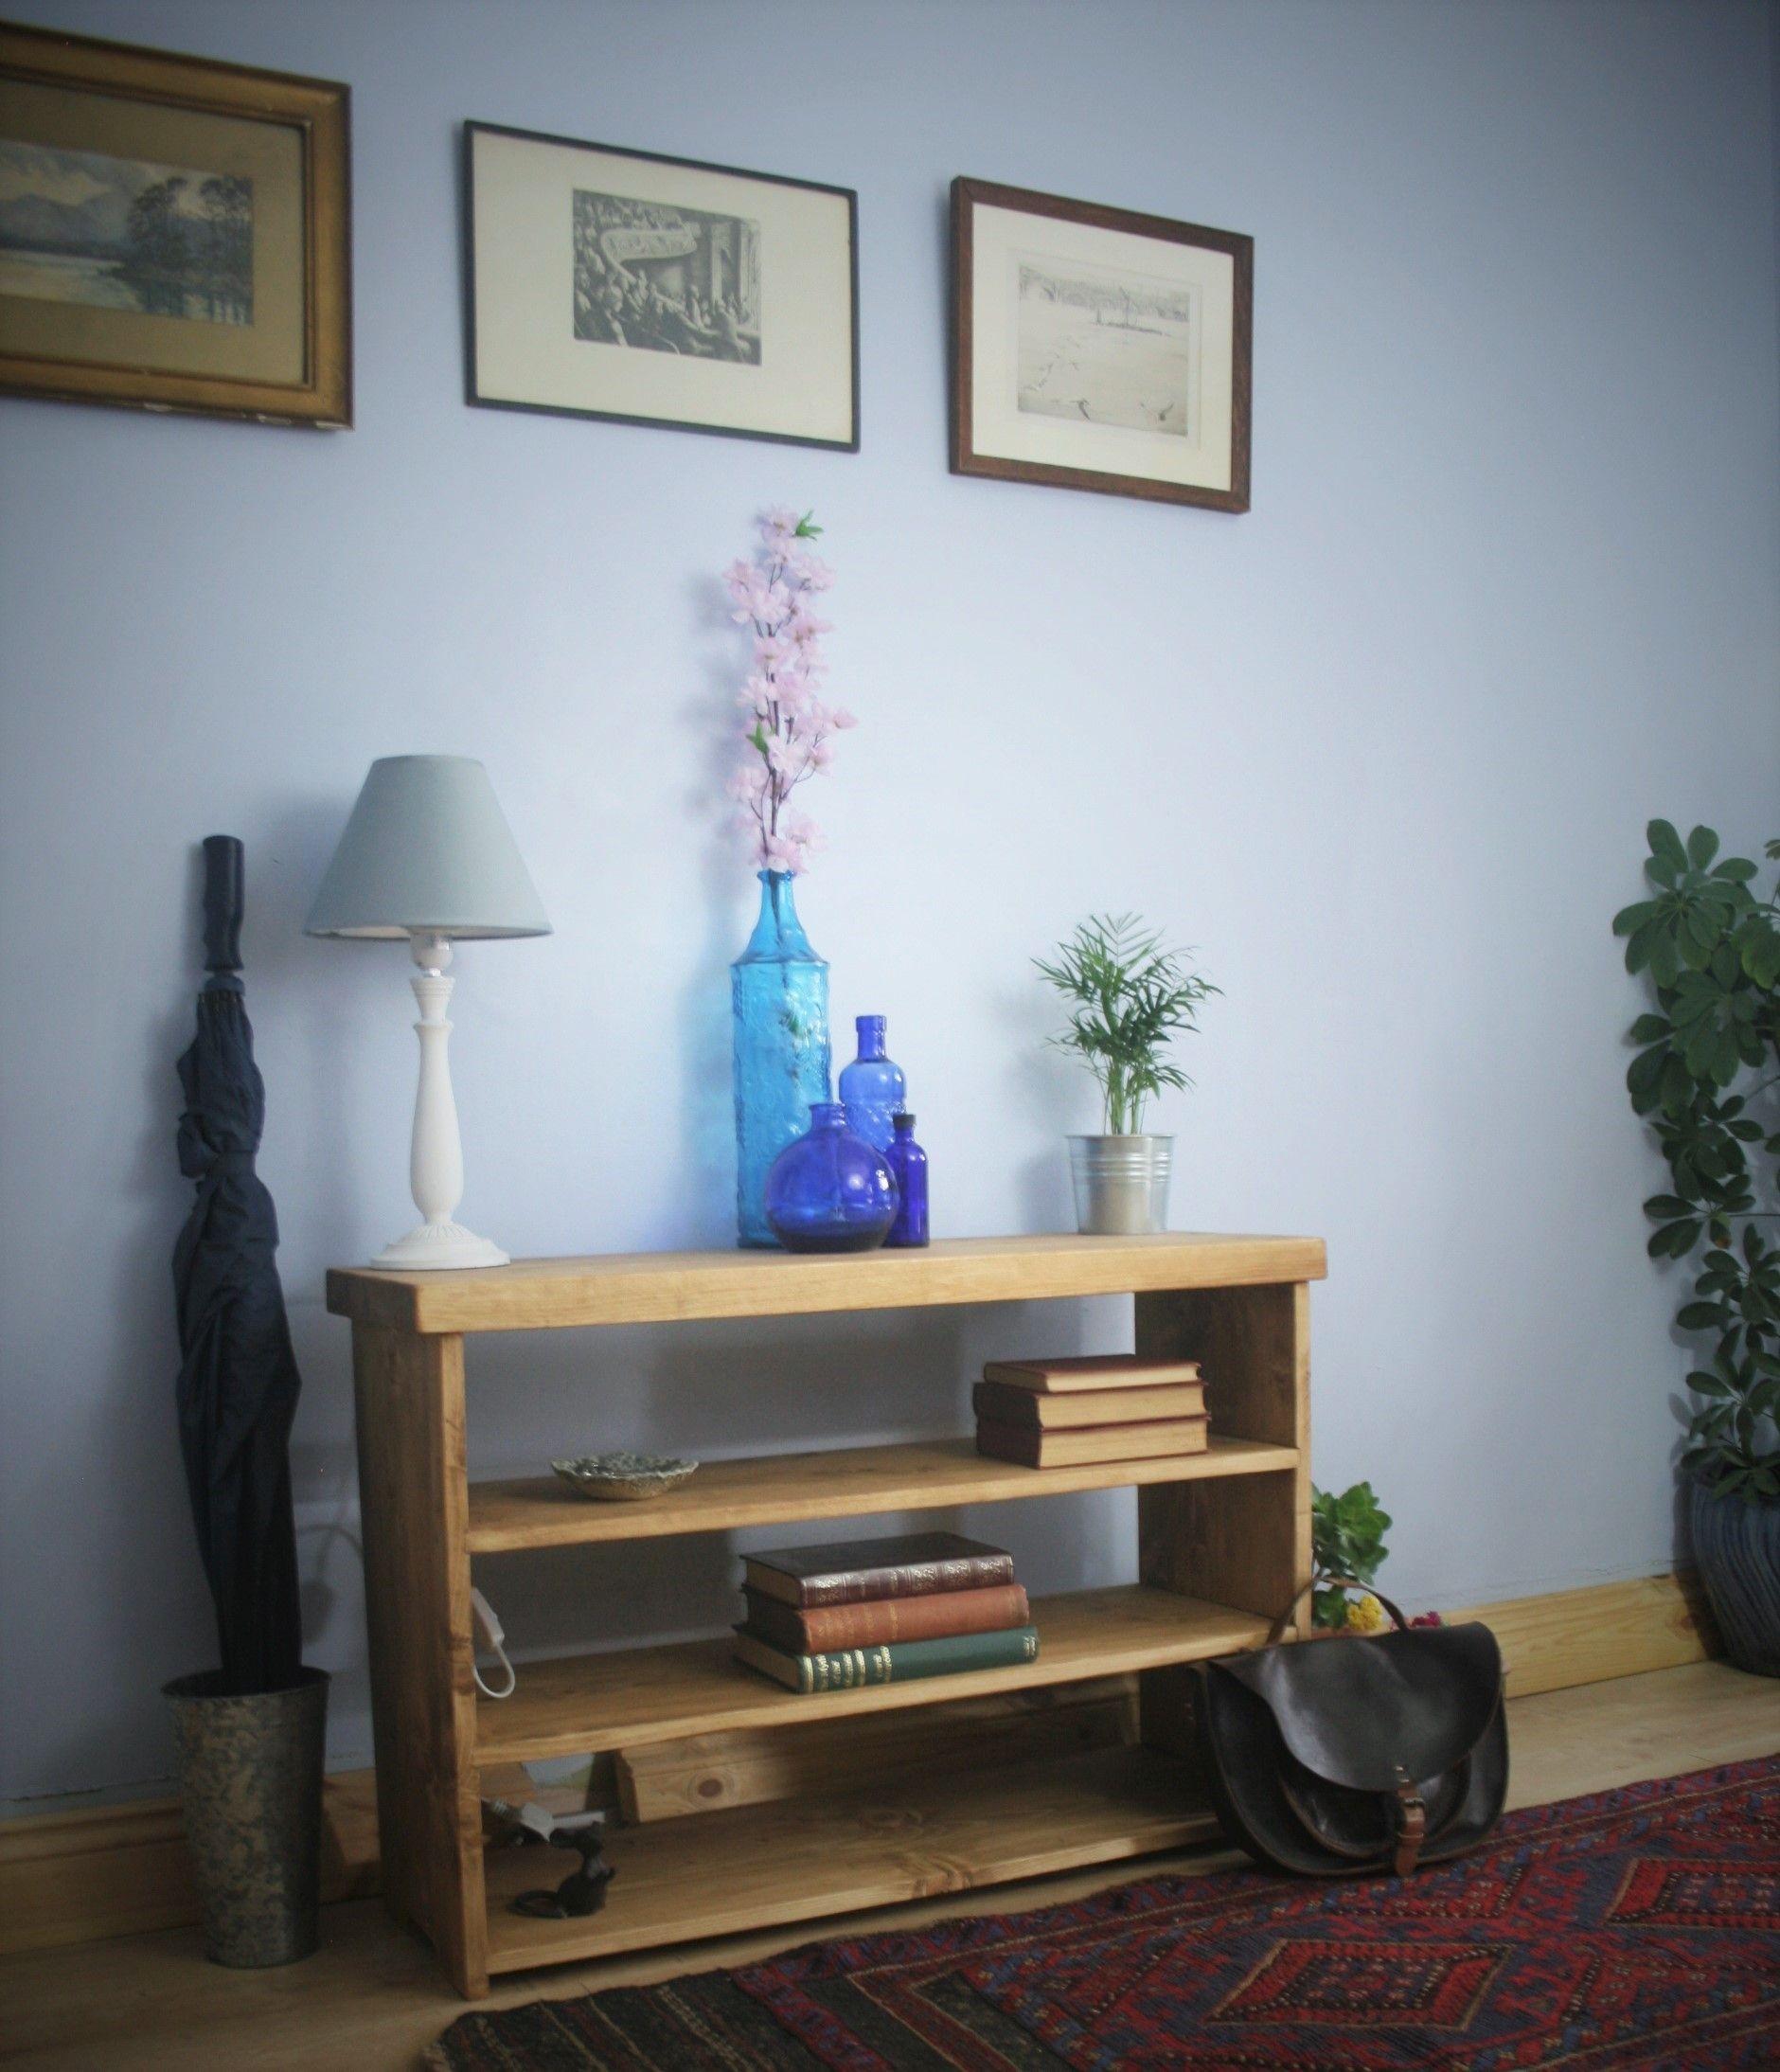 Custom UK Handmade Mid Century Modern Rustic Style Hallway U0026 Entryway  Furniture; Thick Reclaimed Wood